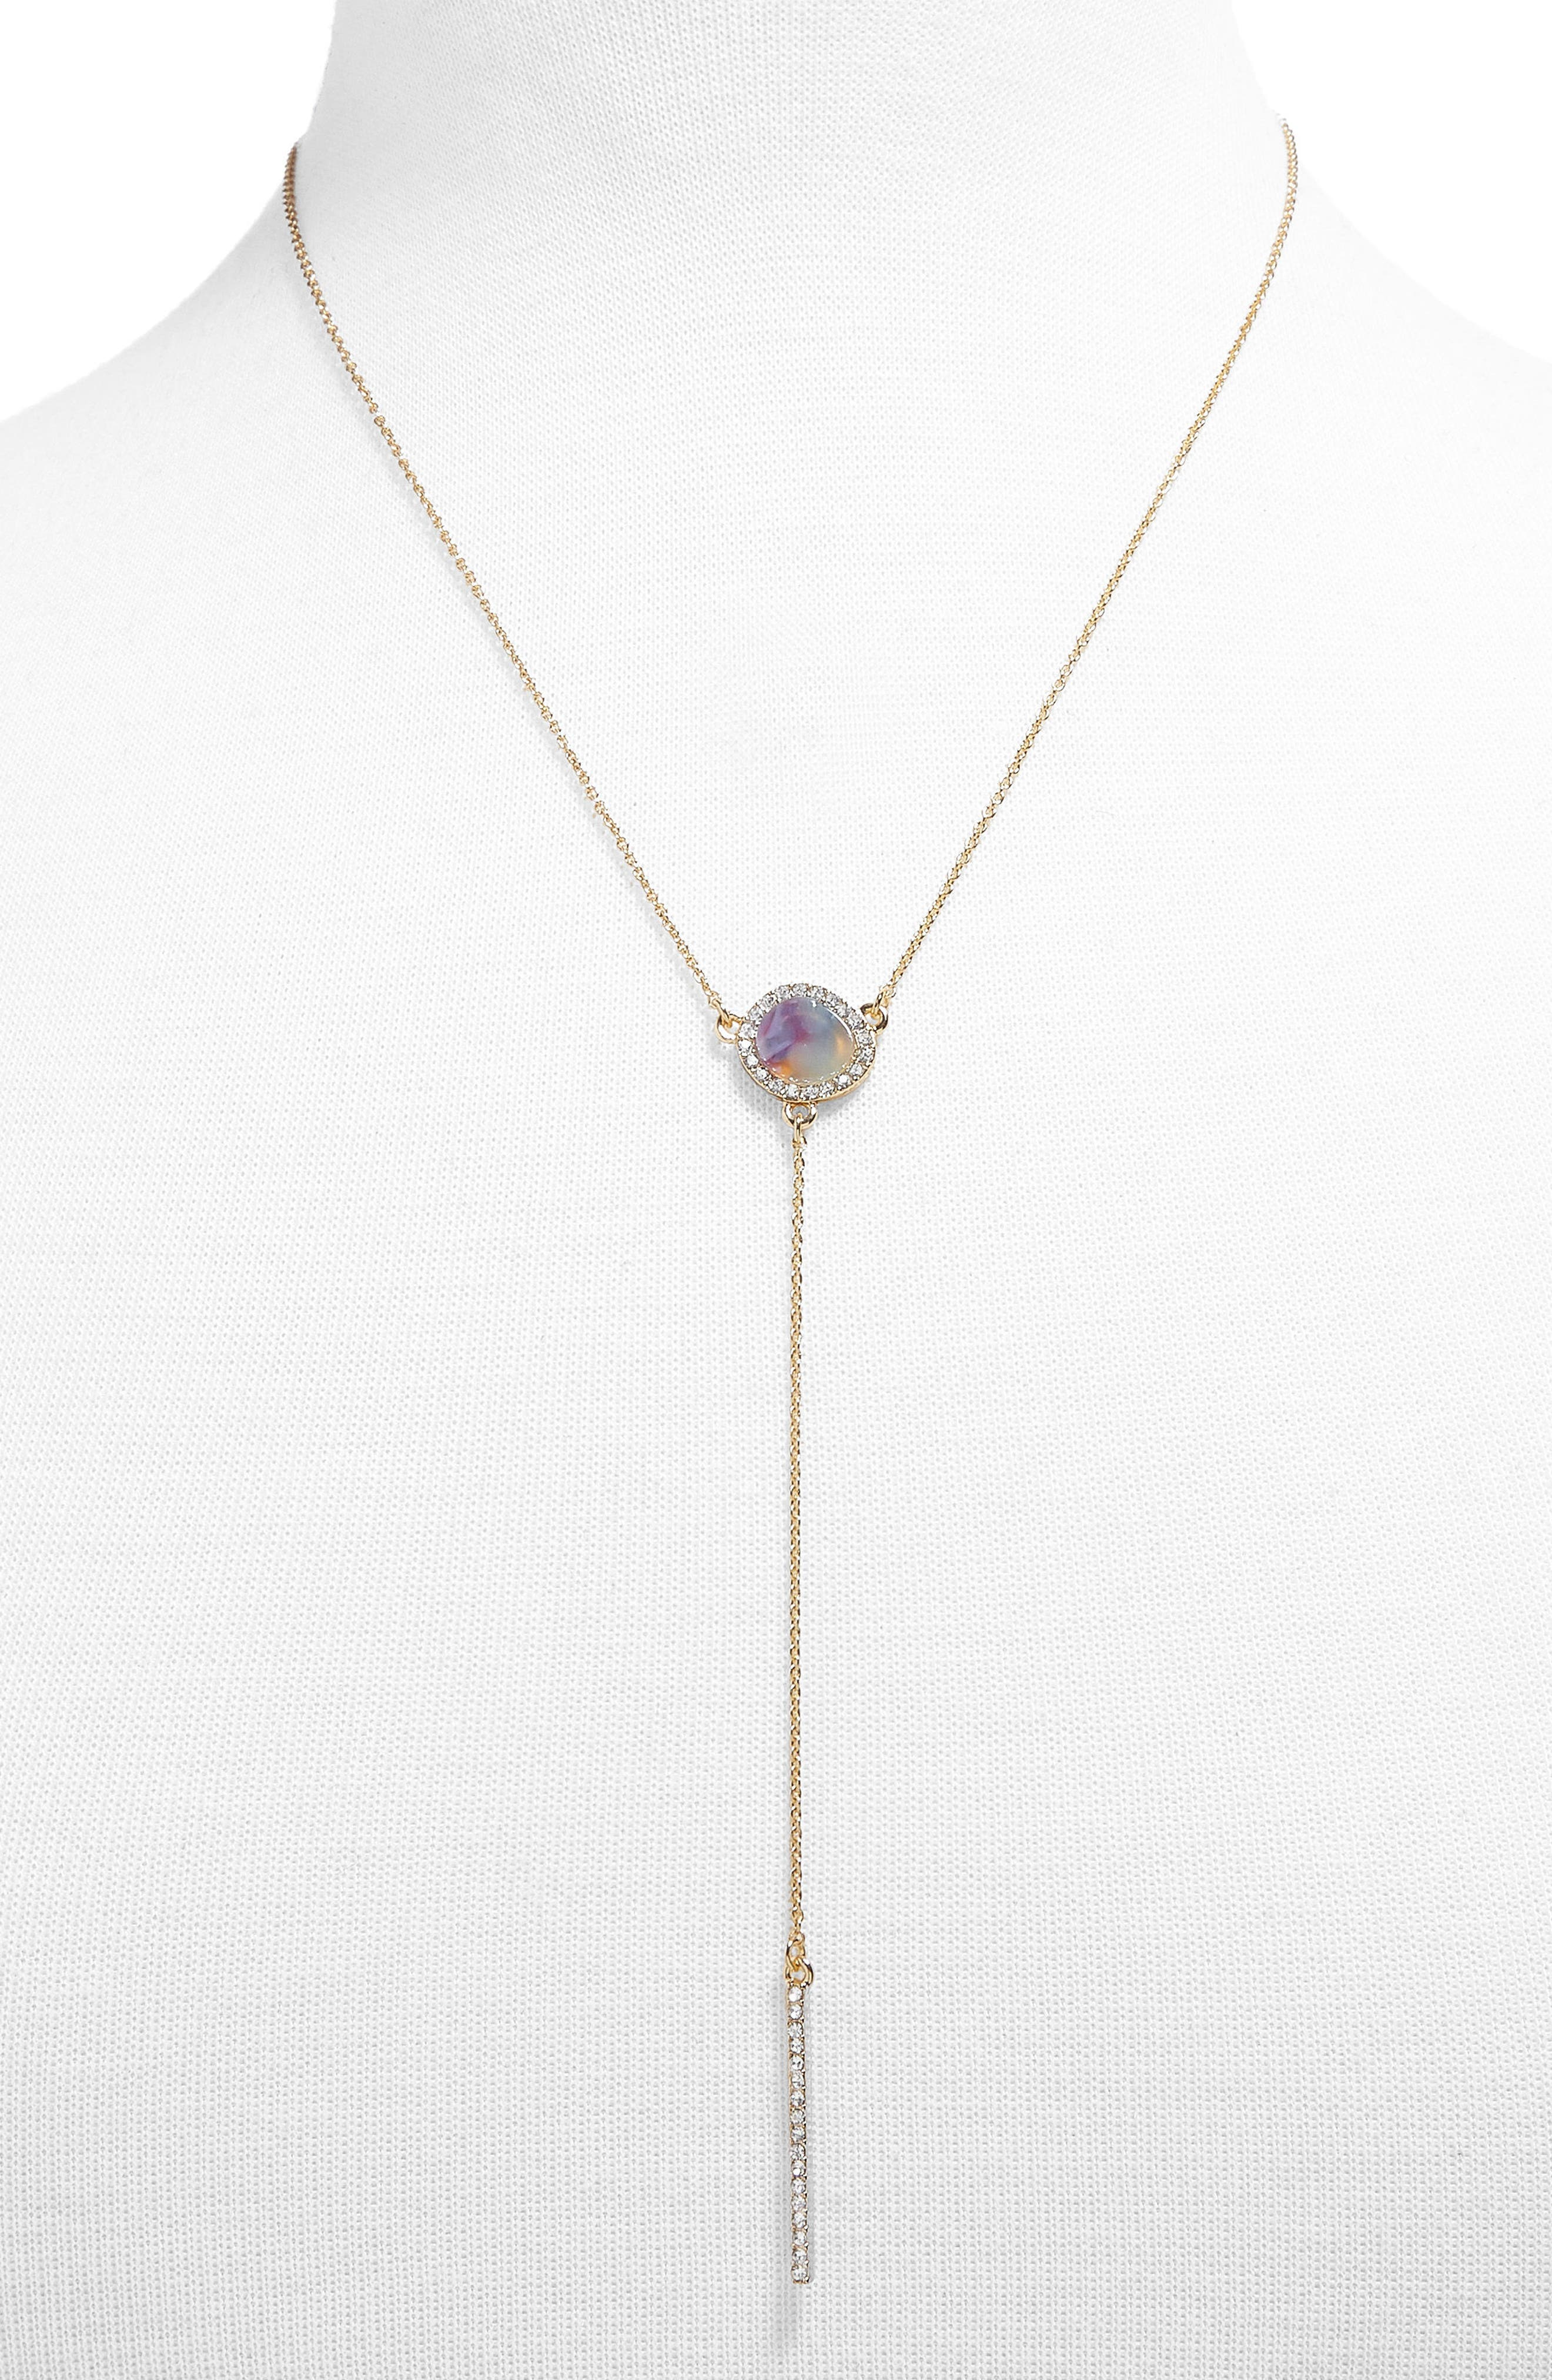 Elsha Chain Y-Necklace,                         Main,                         color, 653